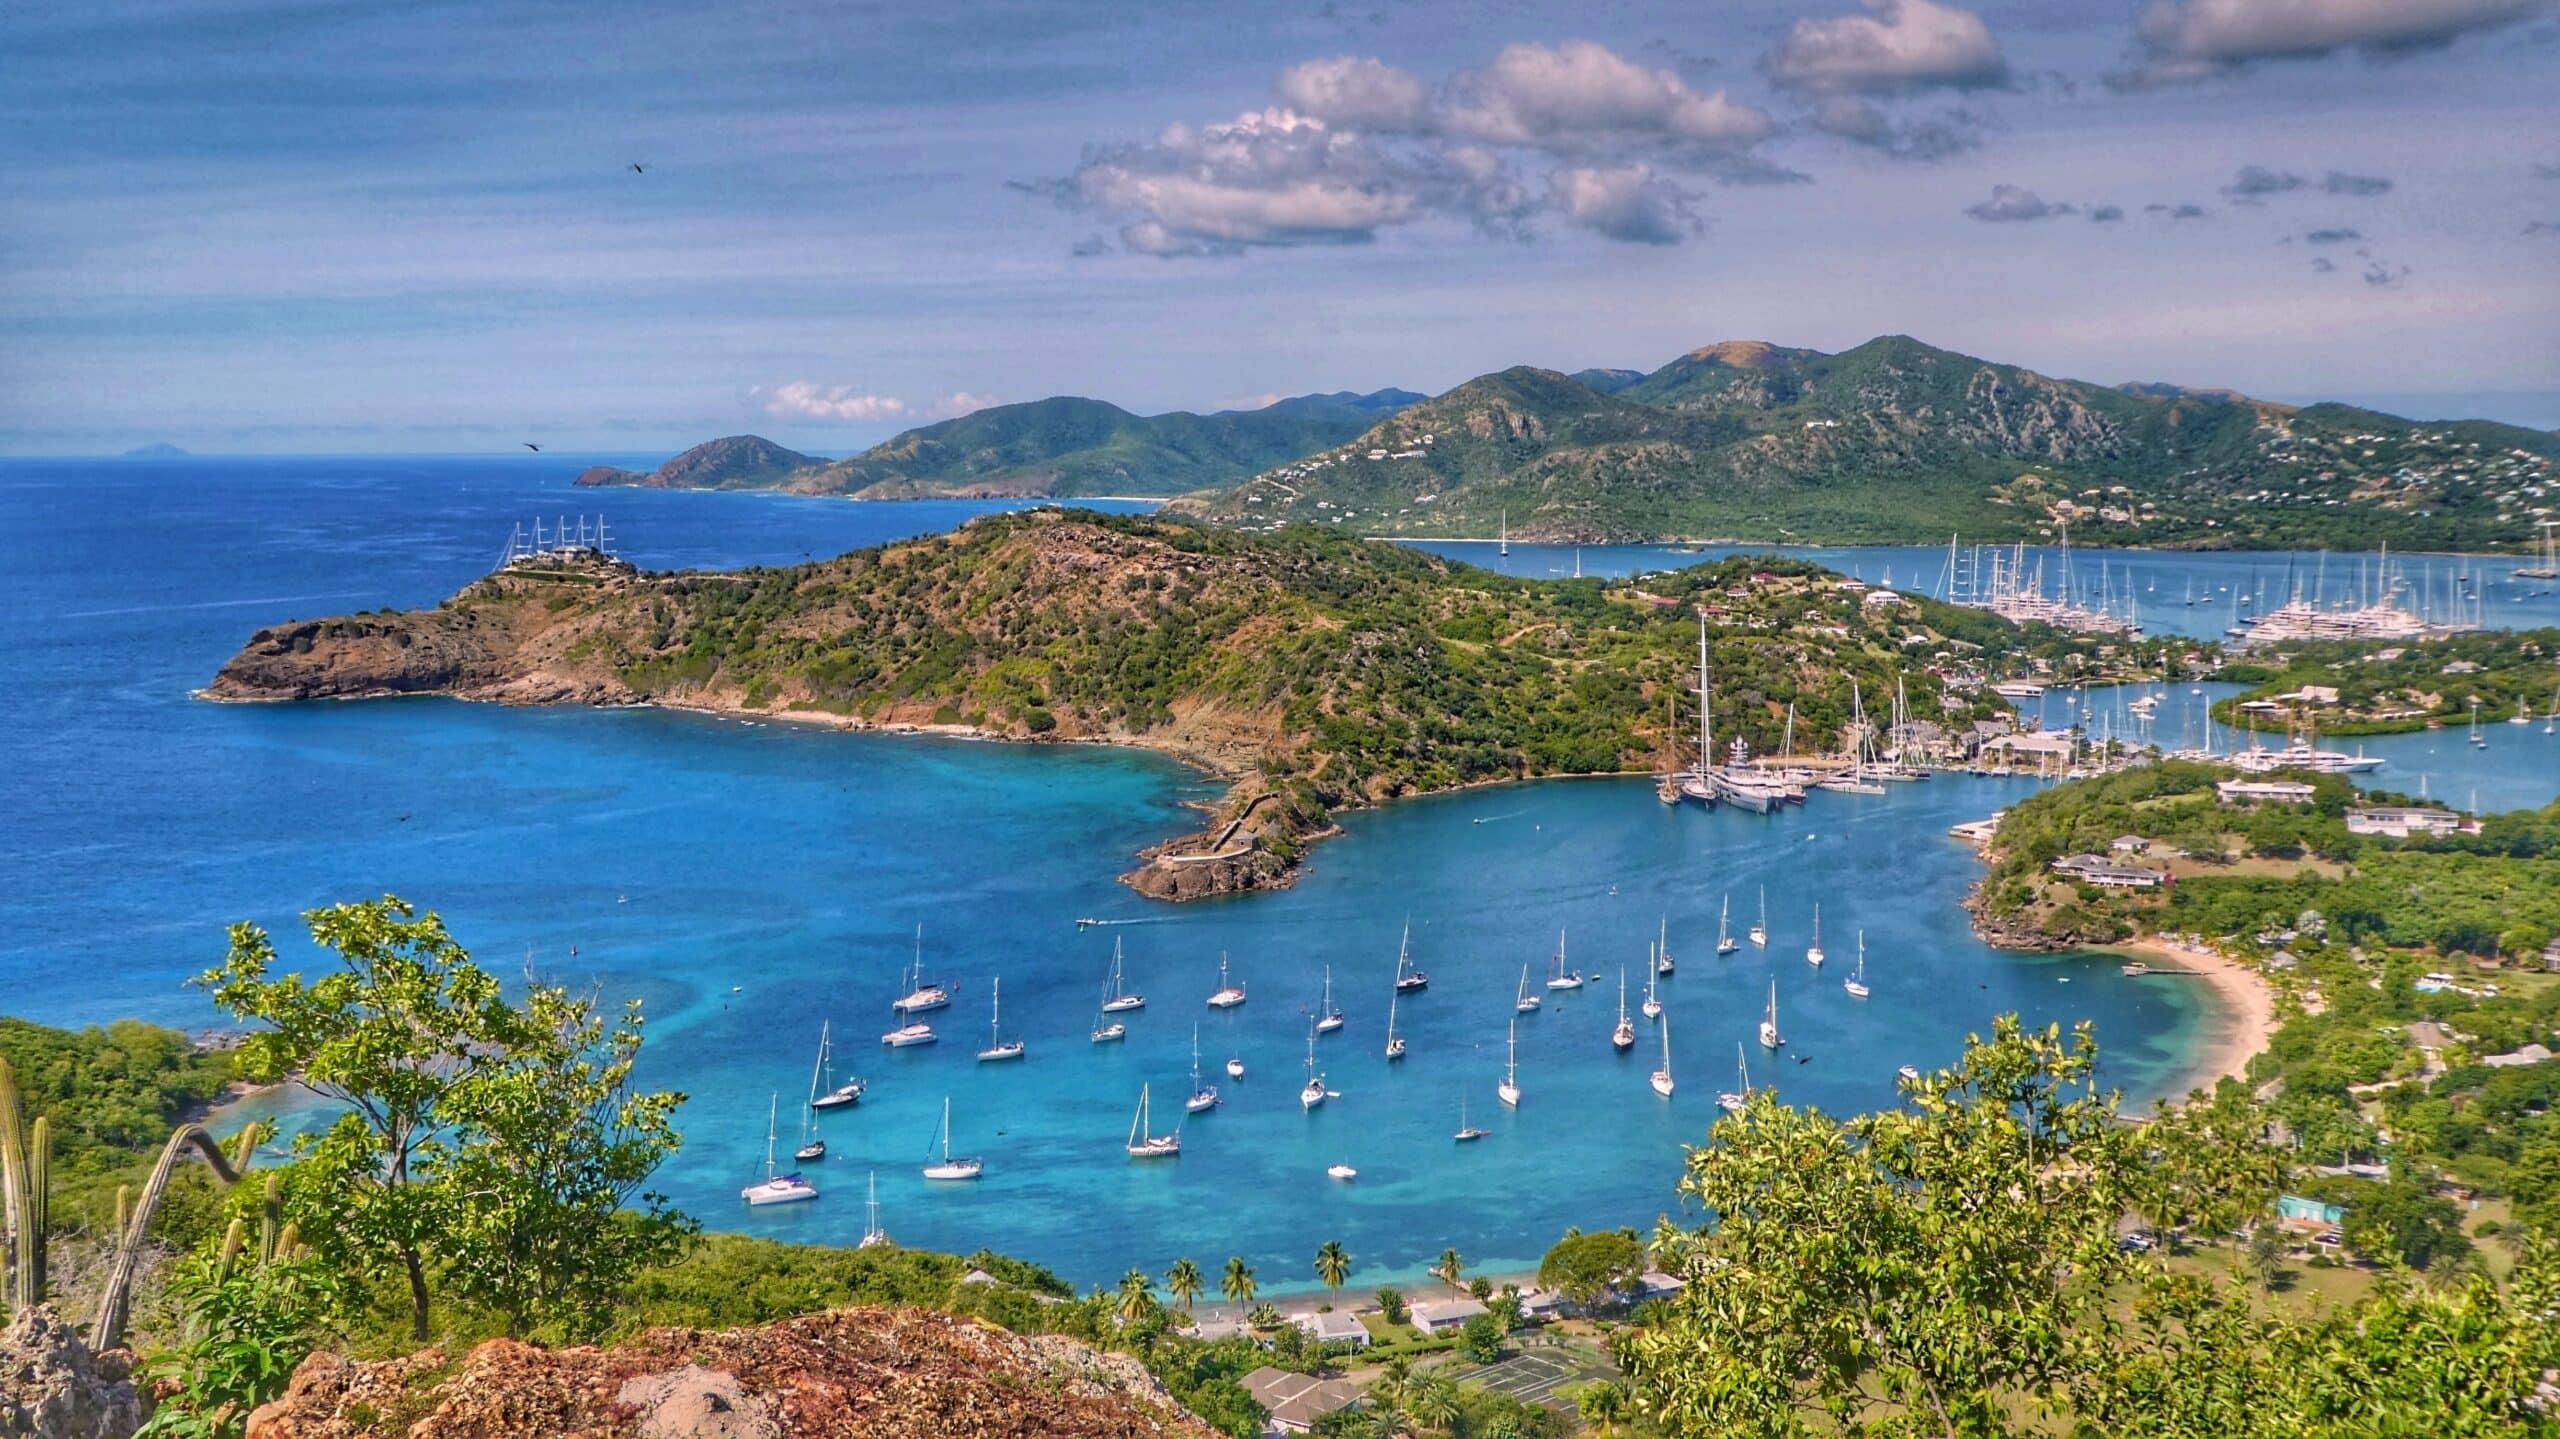 01/29/2020 – Antigua